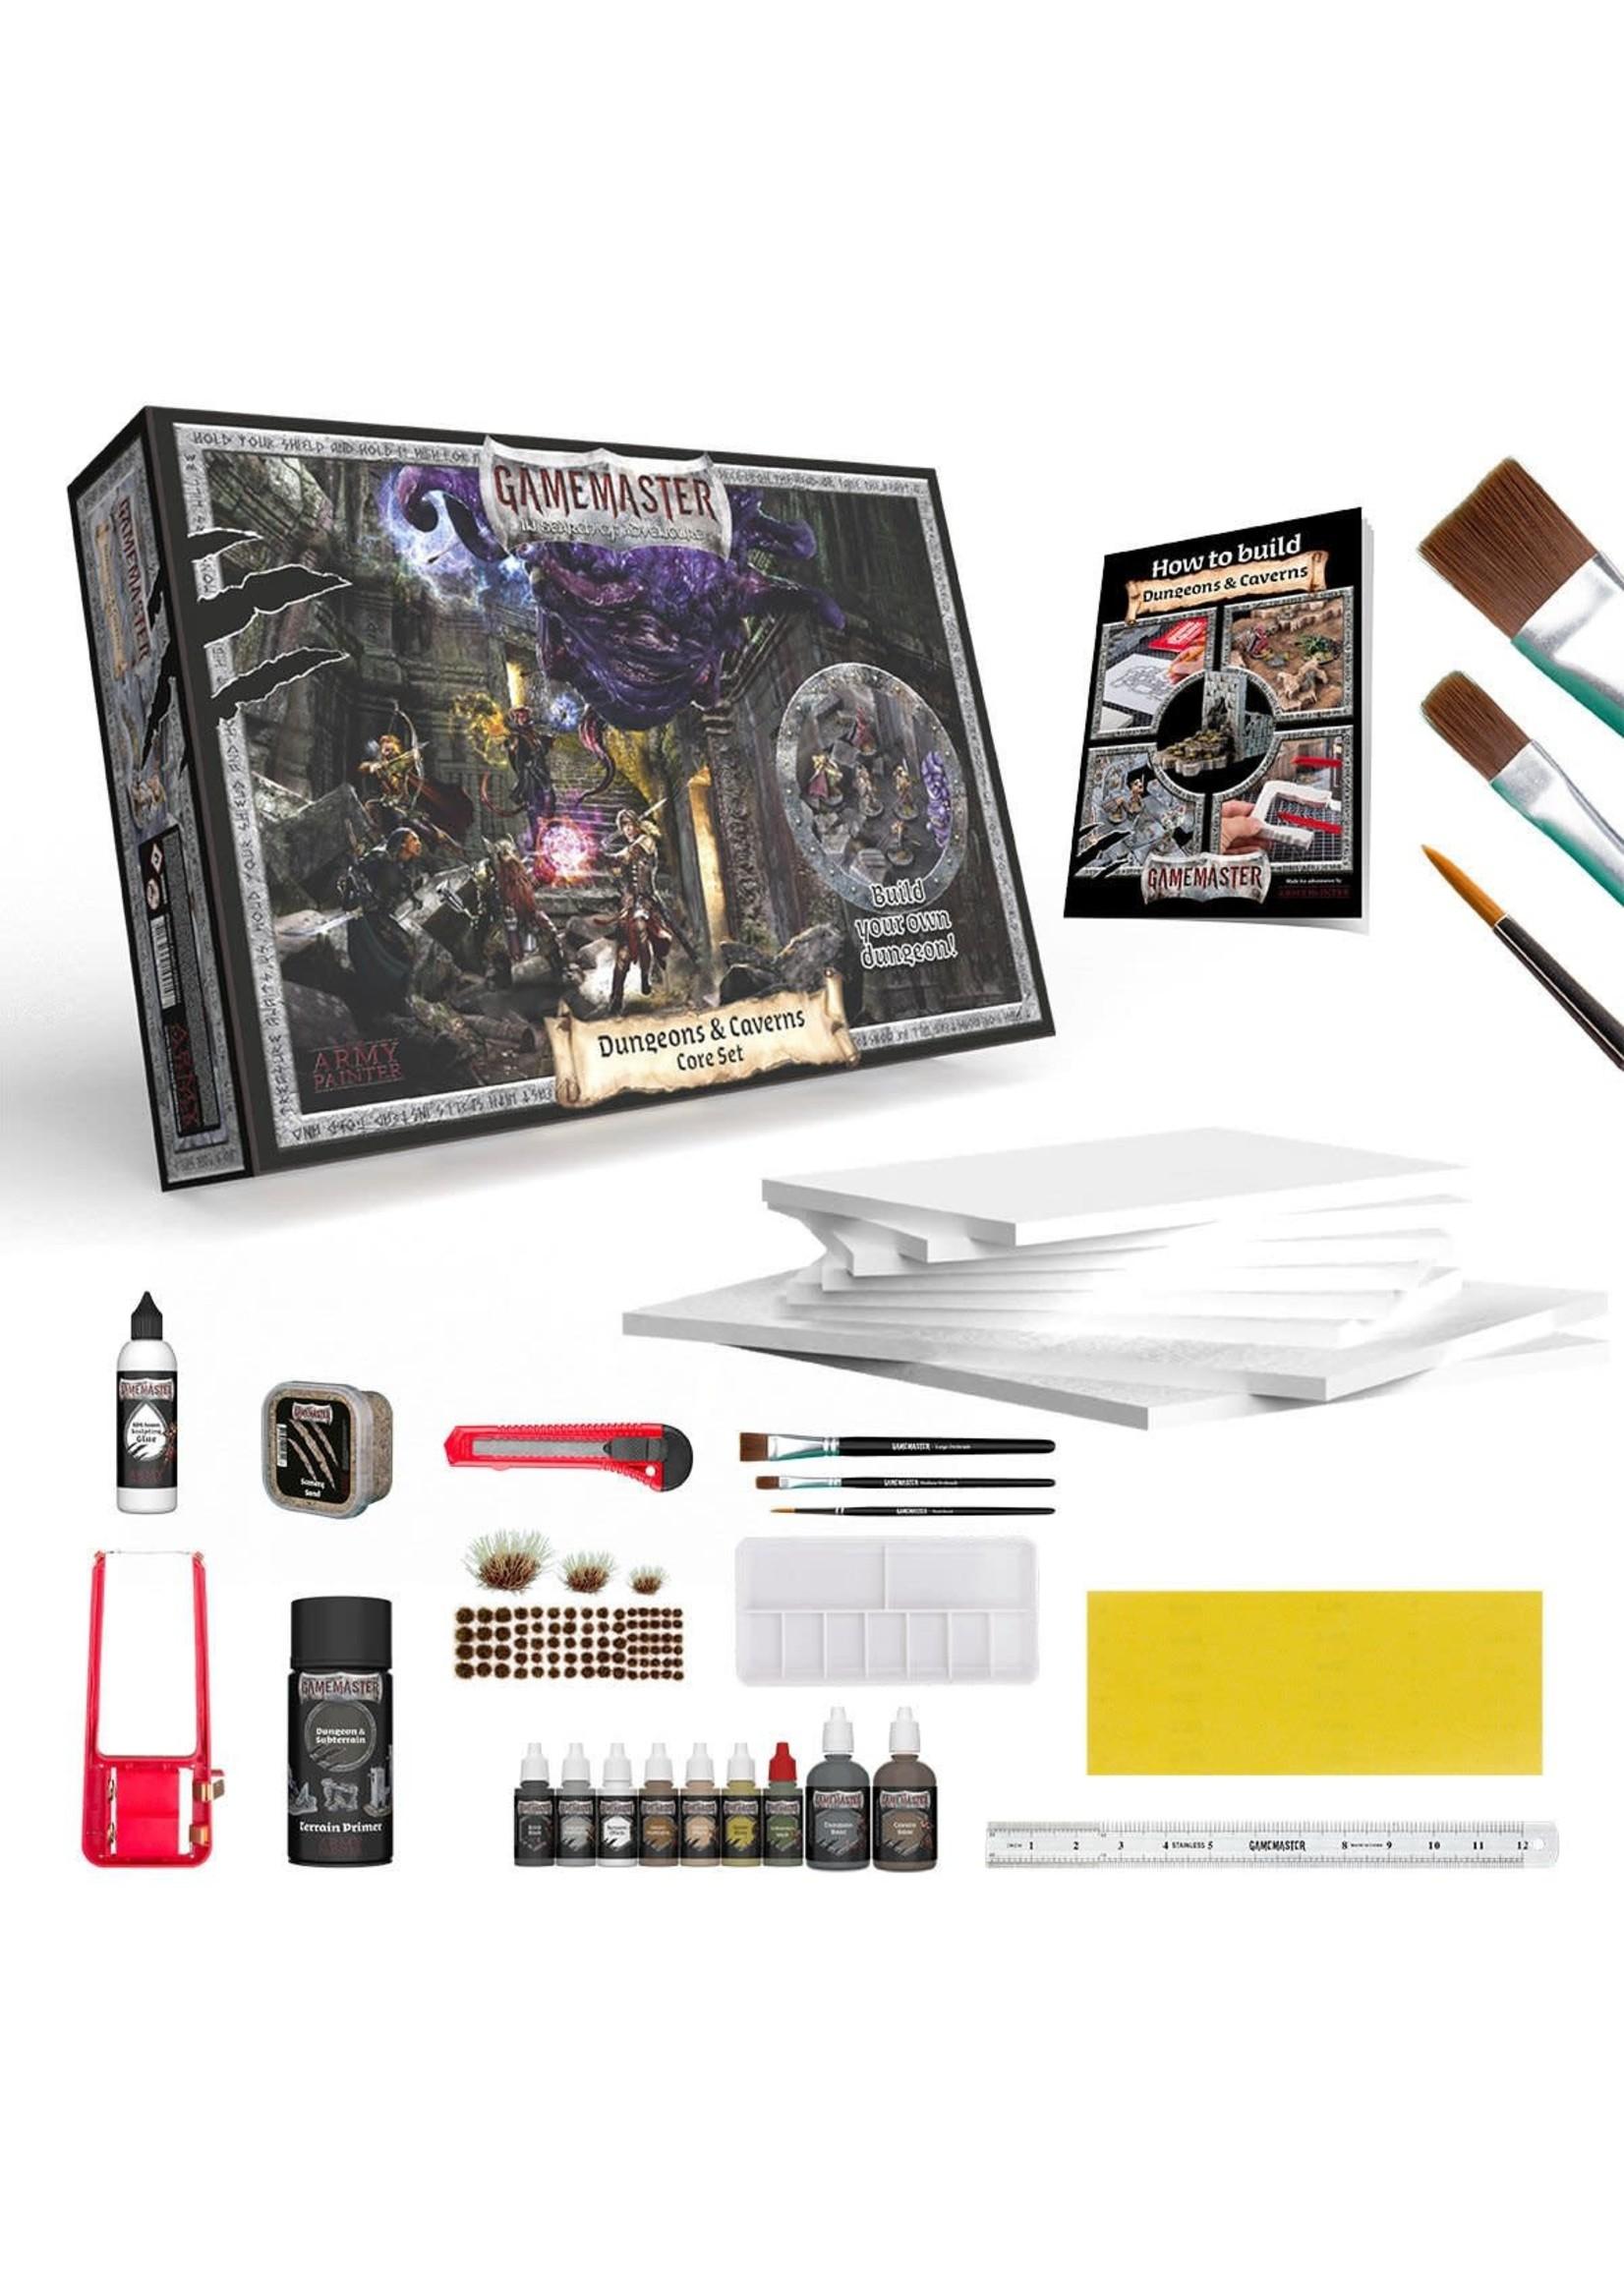 Dungeon's & Caverns Core Set